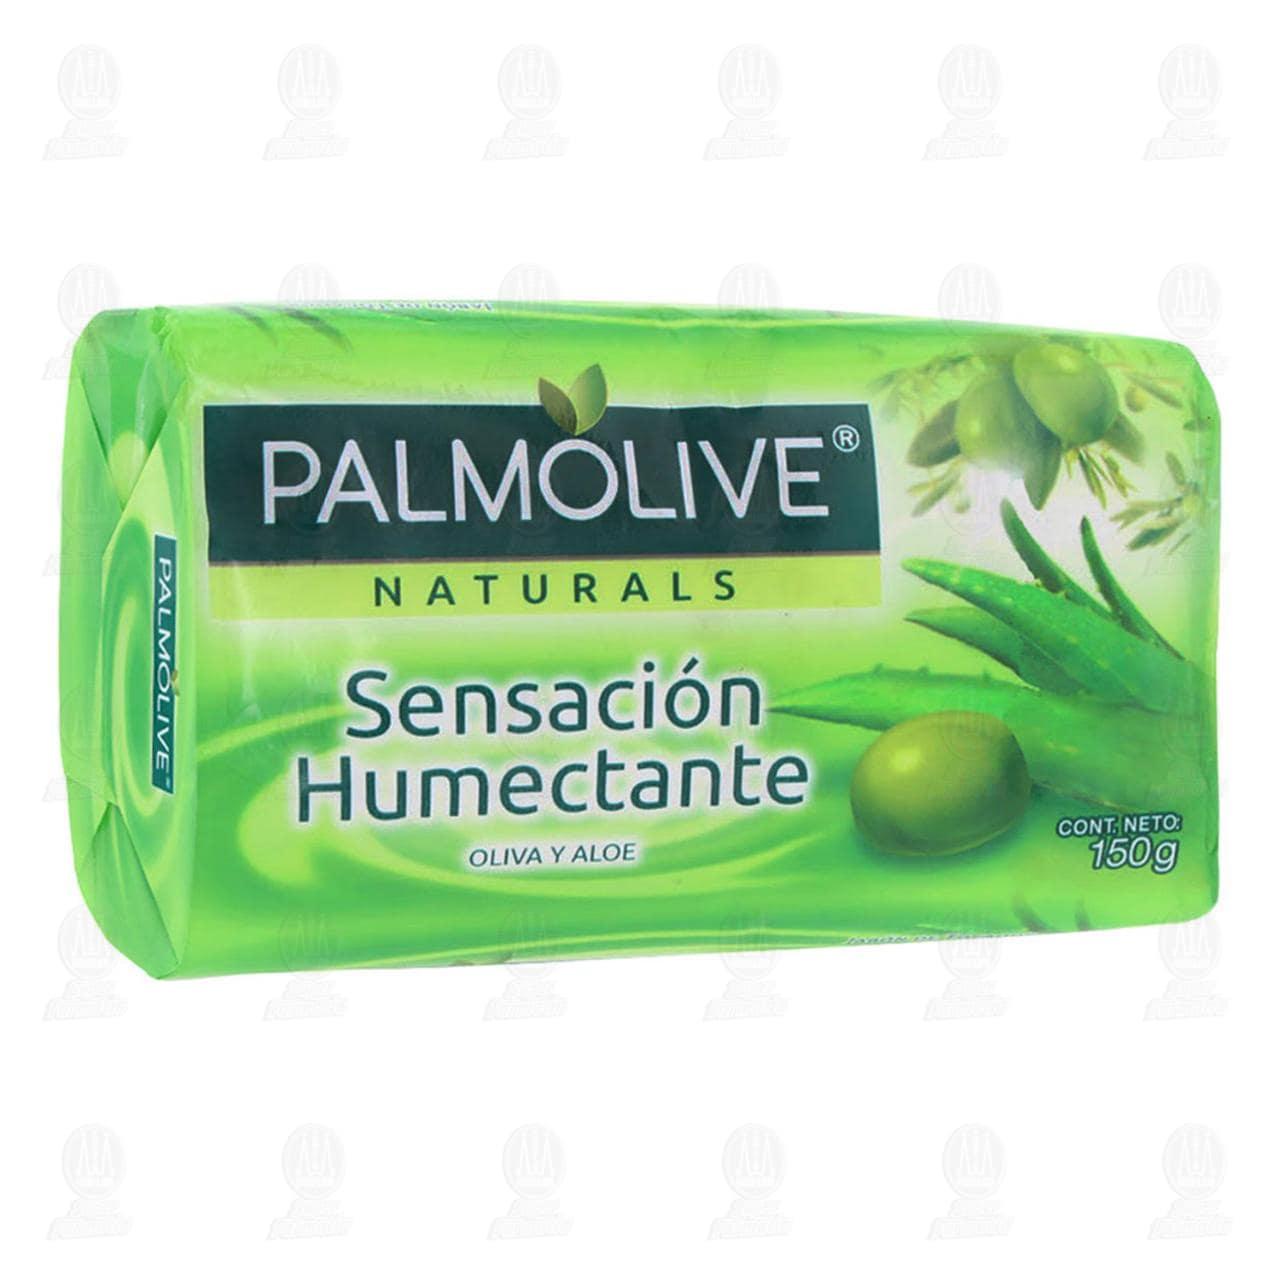 Jabón en Barra Palmolive Naturals Sensación Humectante, 150 gr.